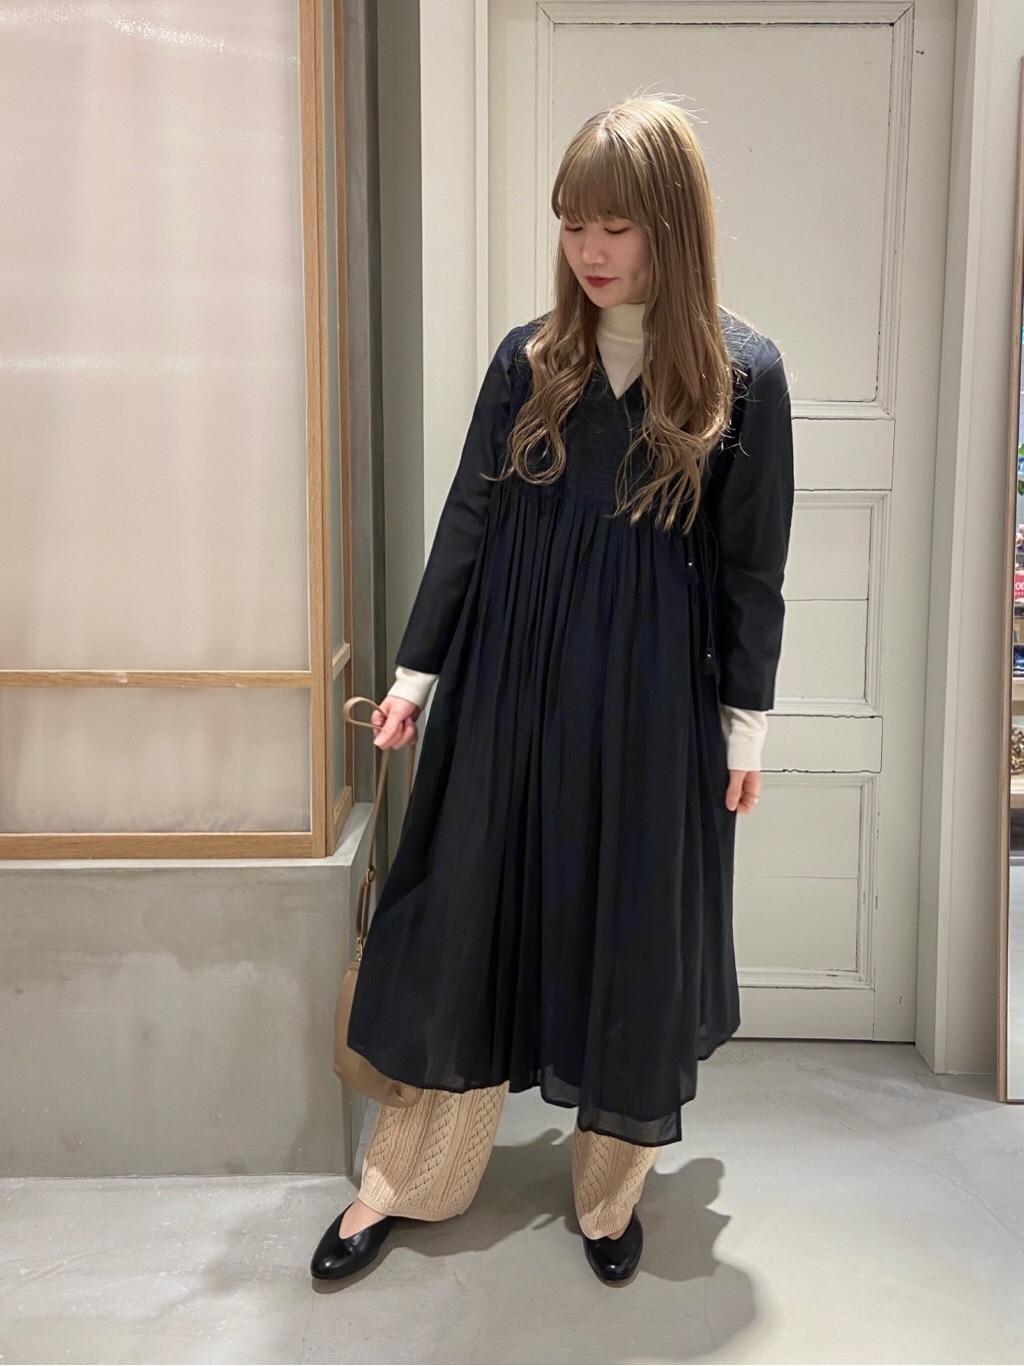 bulle de savon 渋谷スクランブルスクエア 身長:160cm 2021.01.04